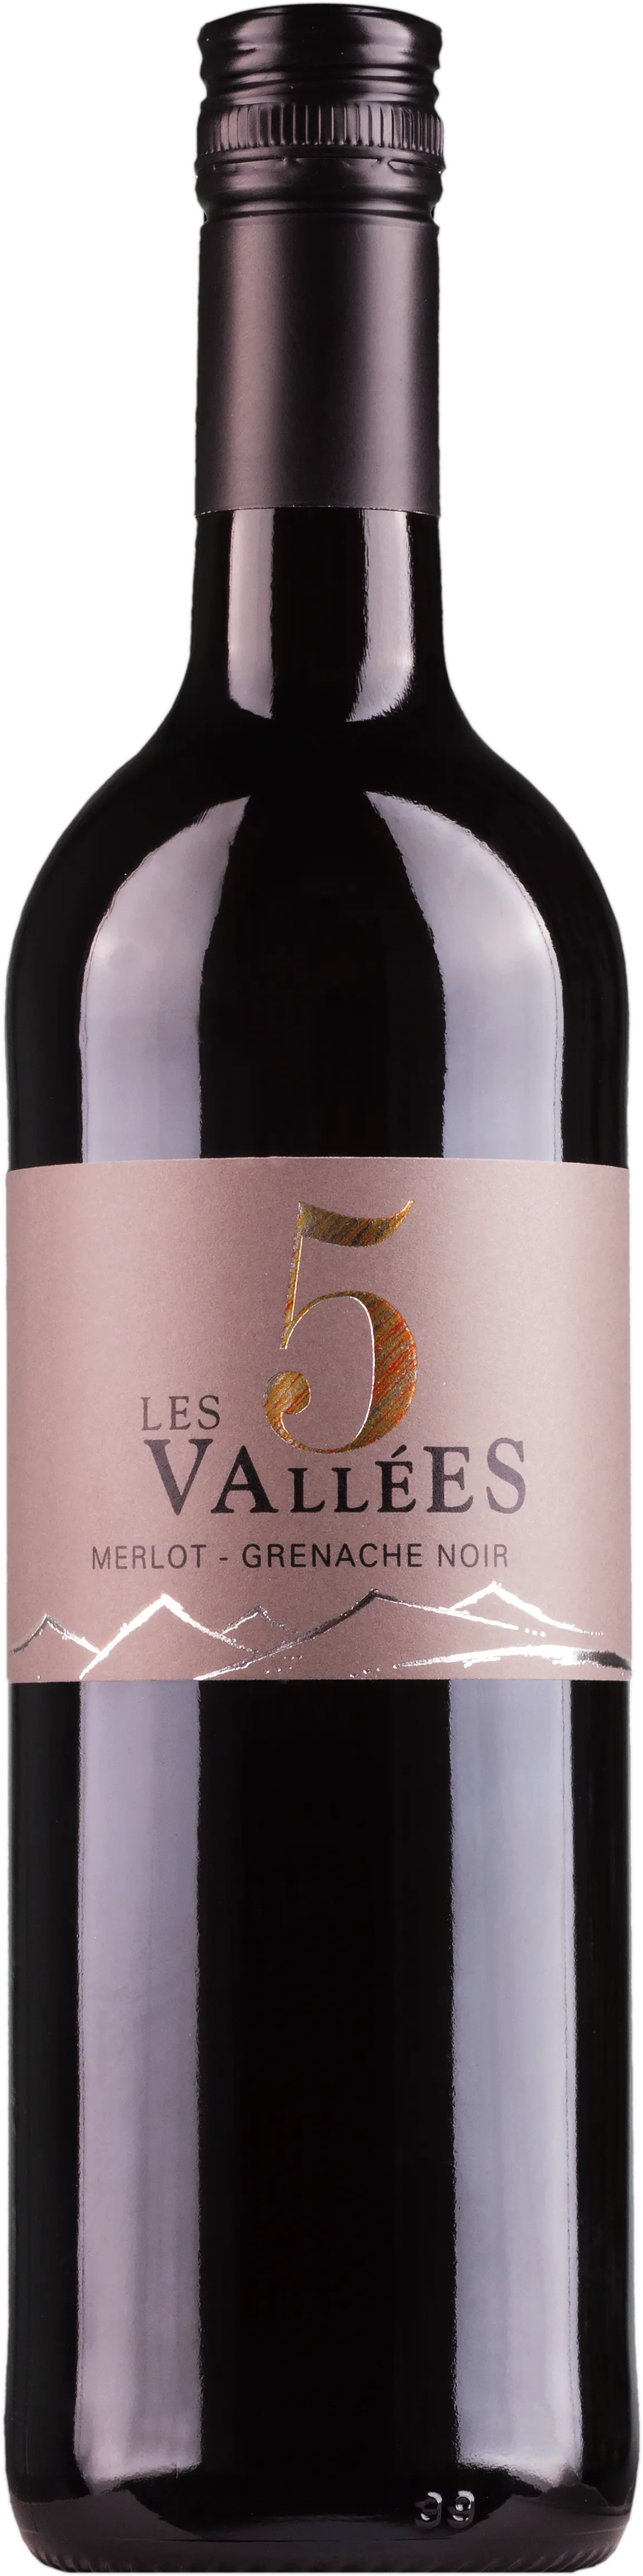 6 Flaschen Merlot/Grenache Noir Les 5 Vallees | Domaines Paul Mas | 2019 | 0,75 Liter